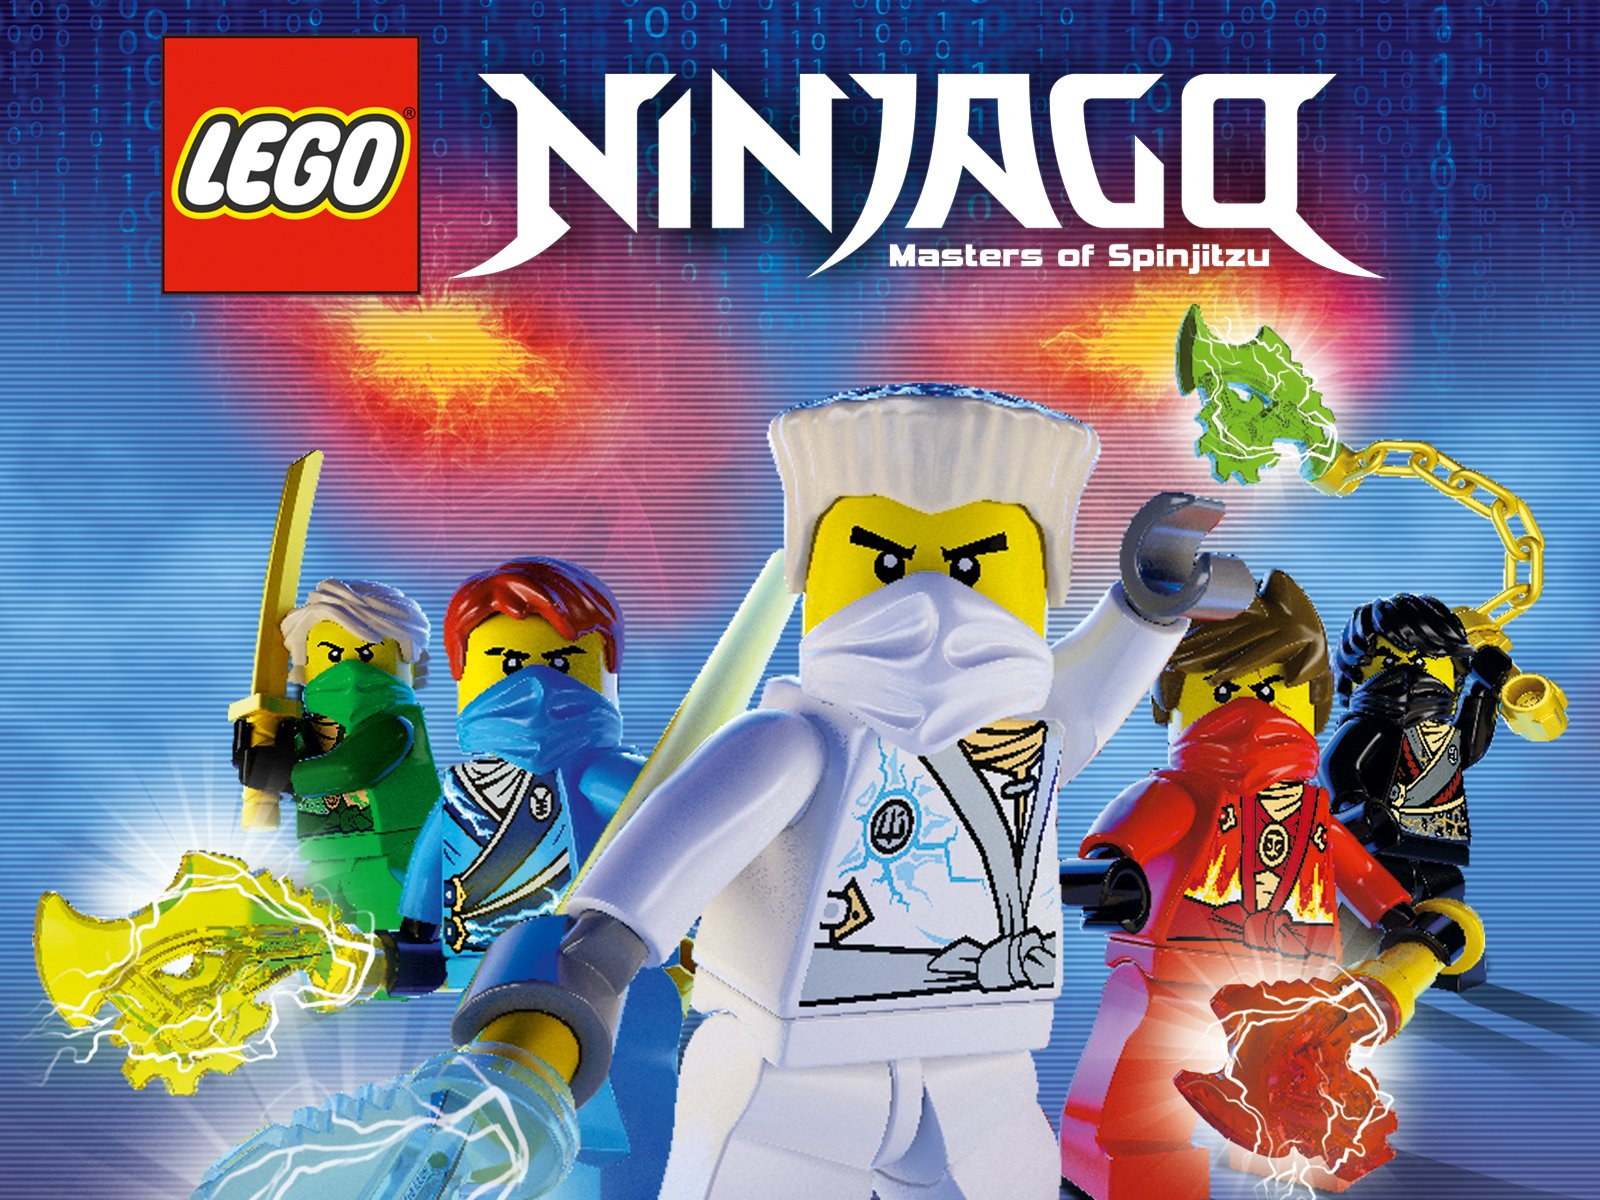 Amazon com: Watch Lego Ninjago: Masters of Spinjitzu